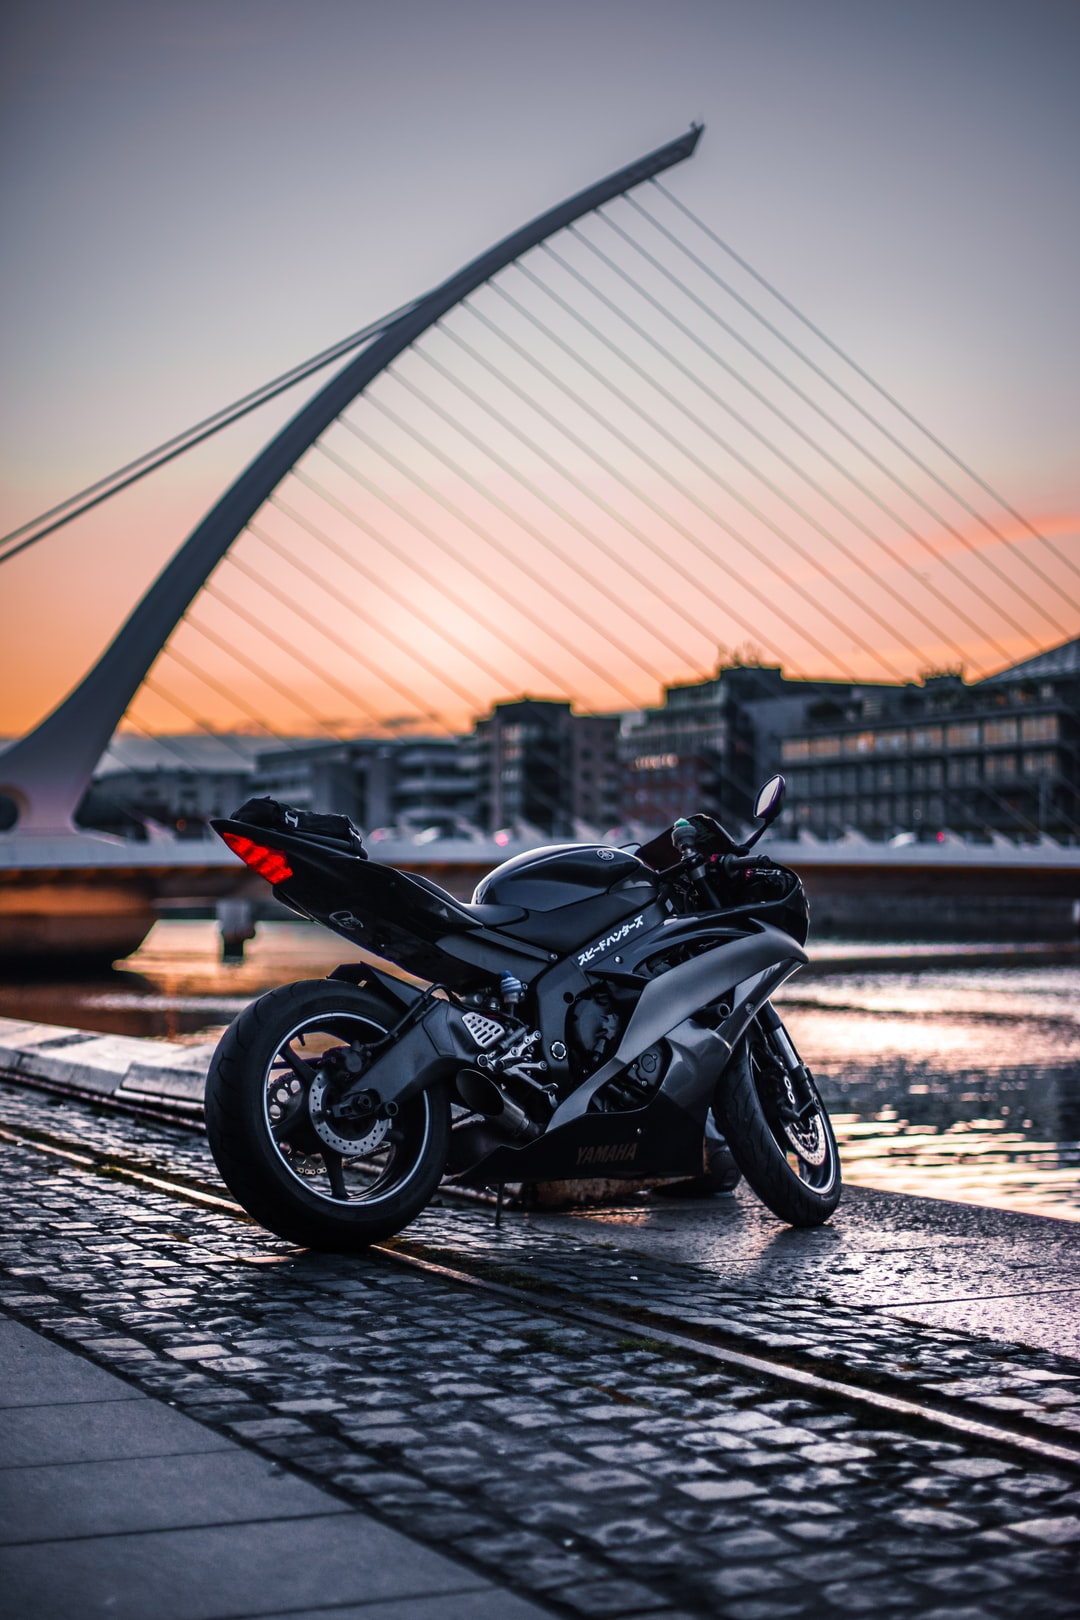 Just a random snap of my bike beside the Samuel Beckett Bridge in Dublin